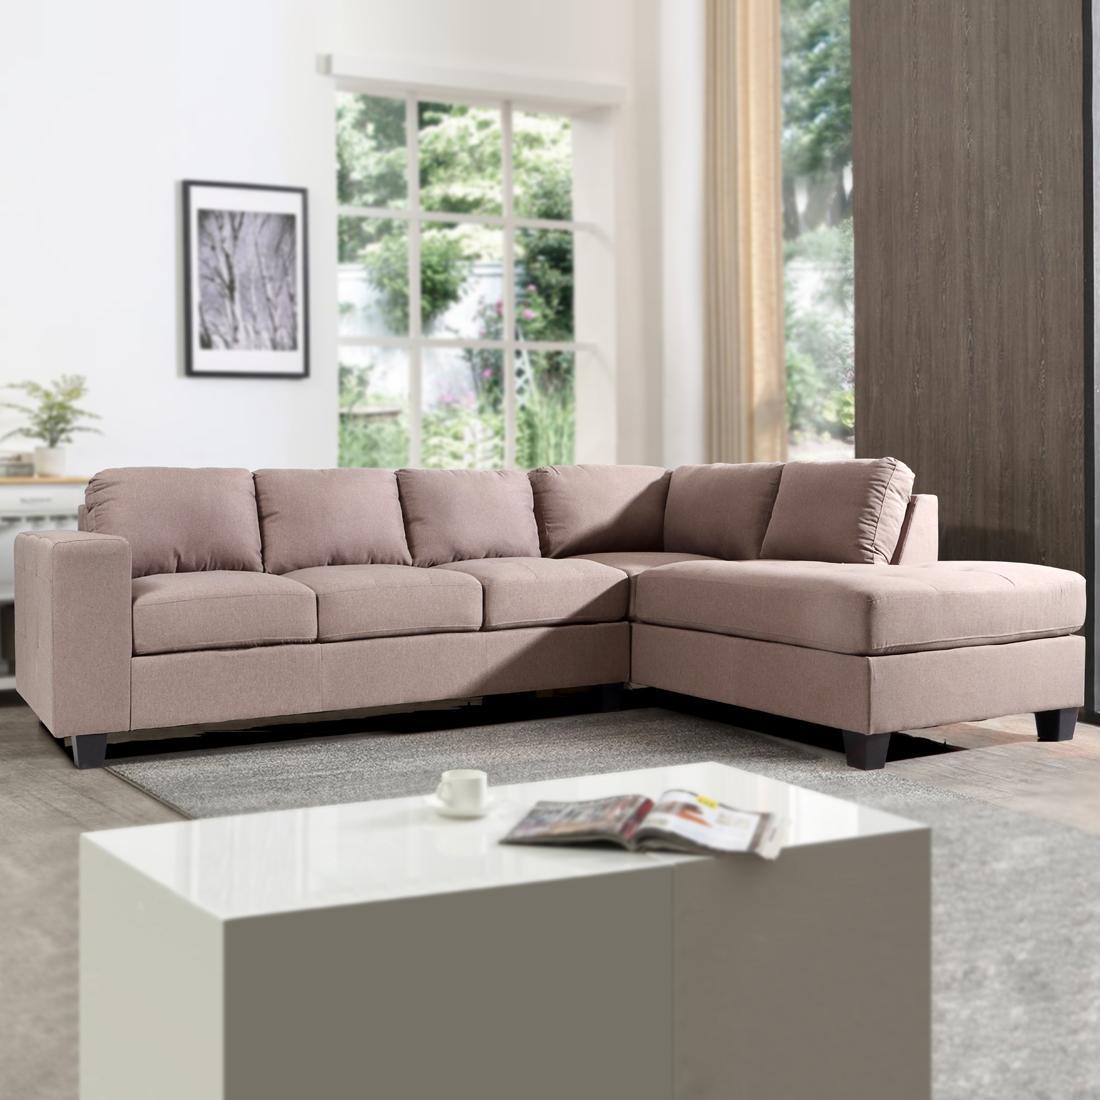 Buy Latvia L Shape Fabric Sofa Right Dark Brown Online Evok